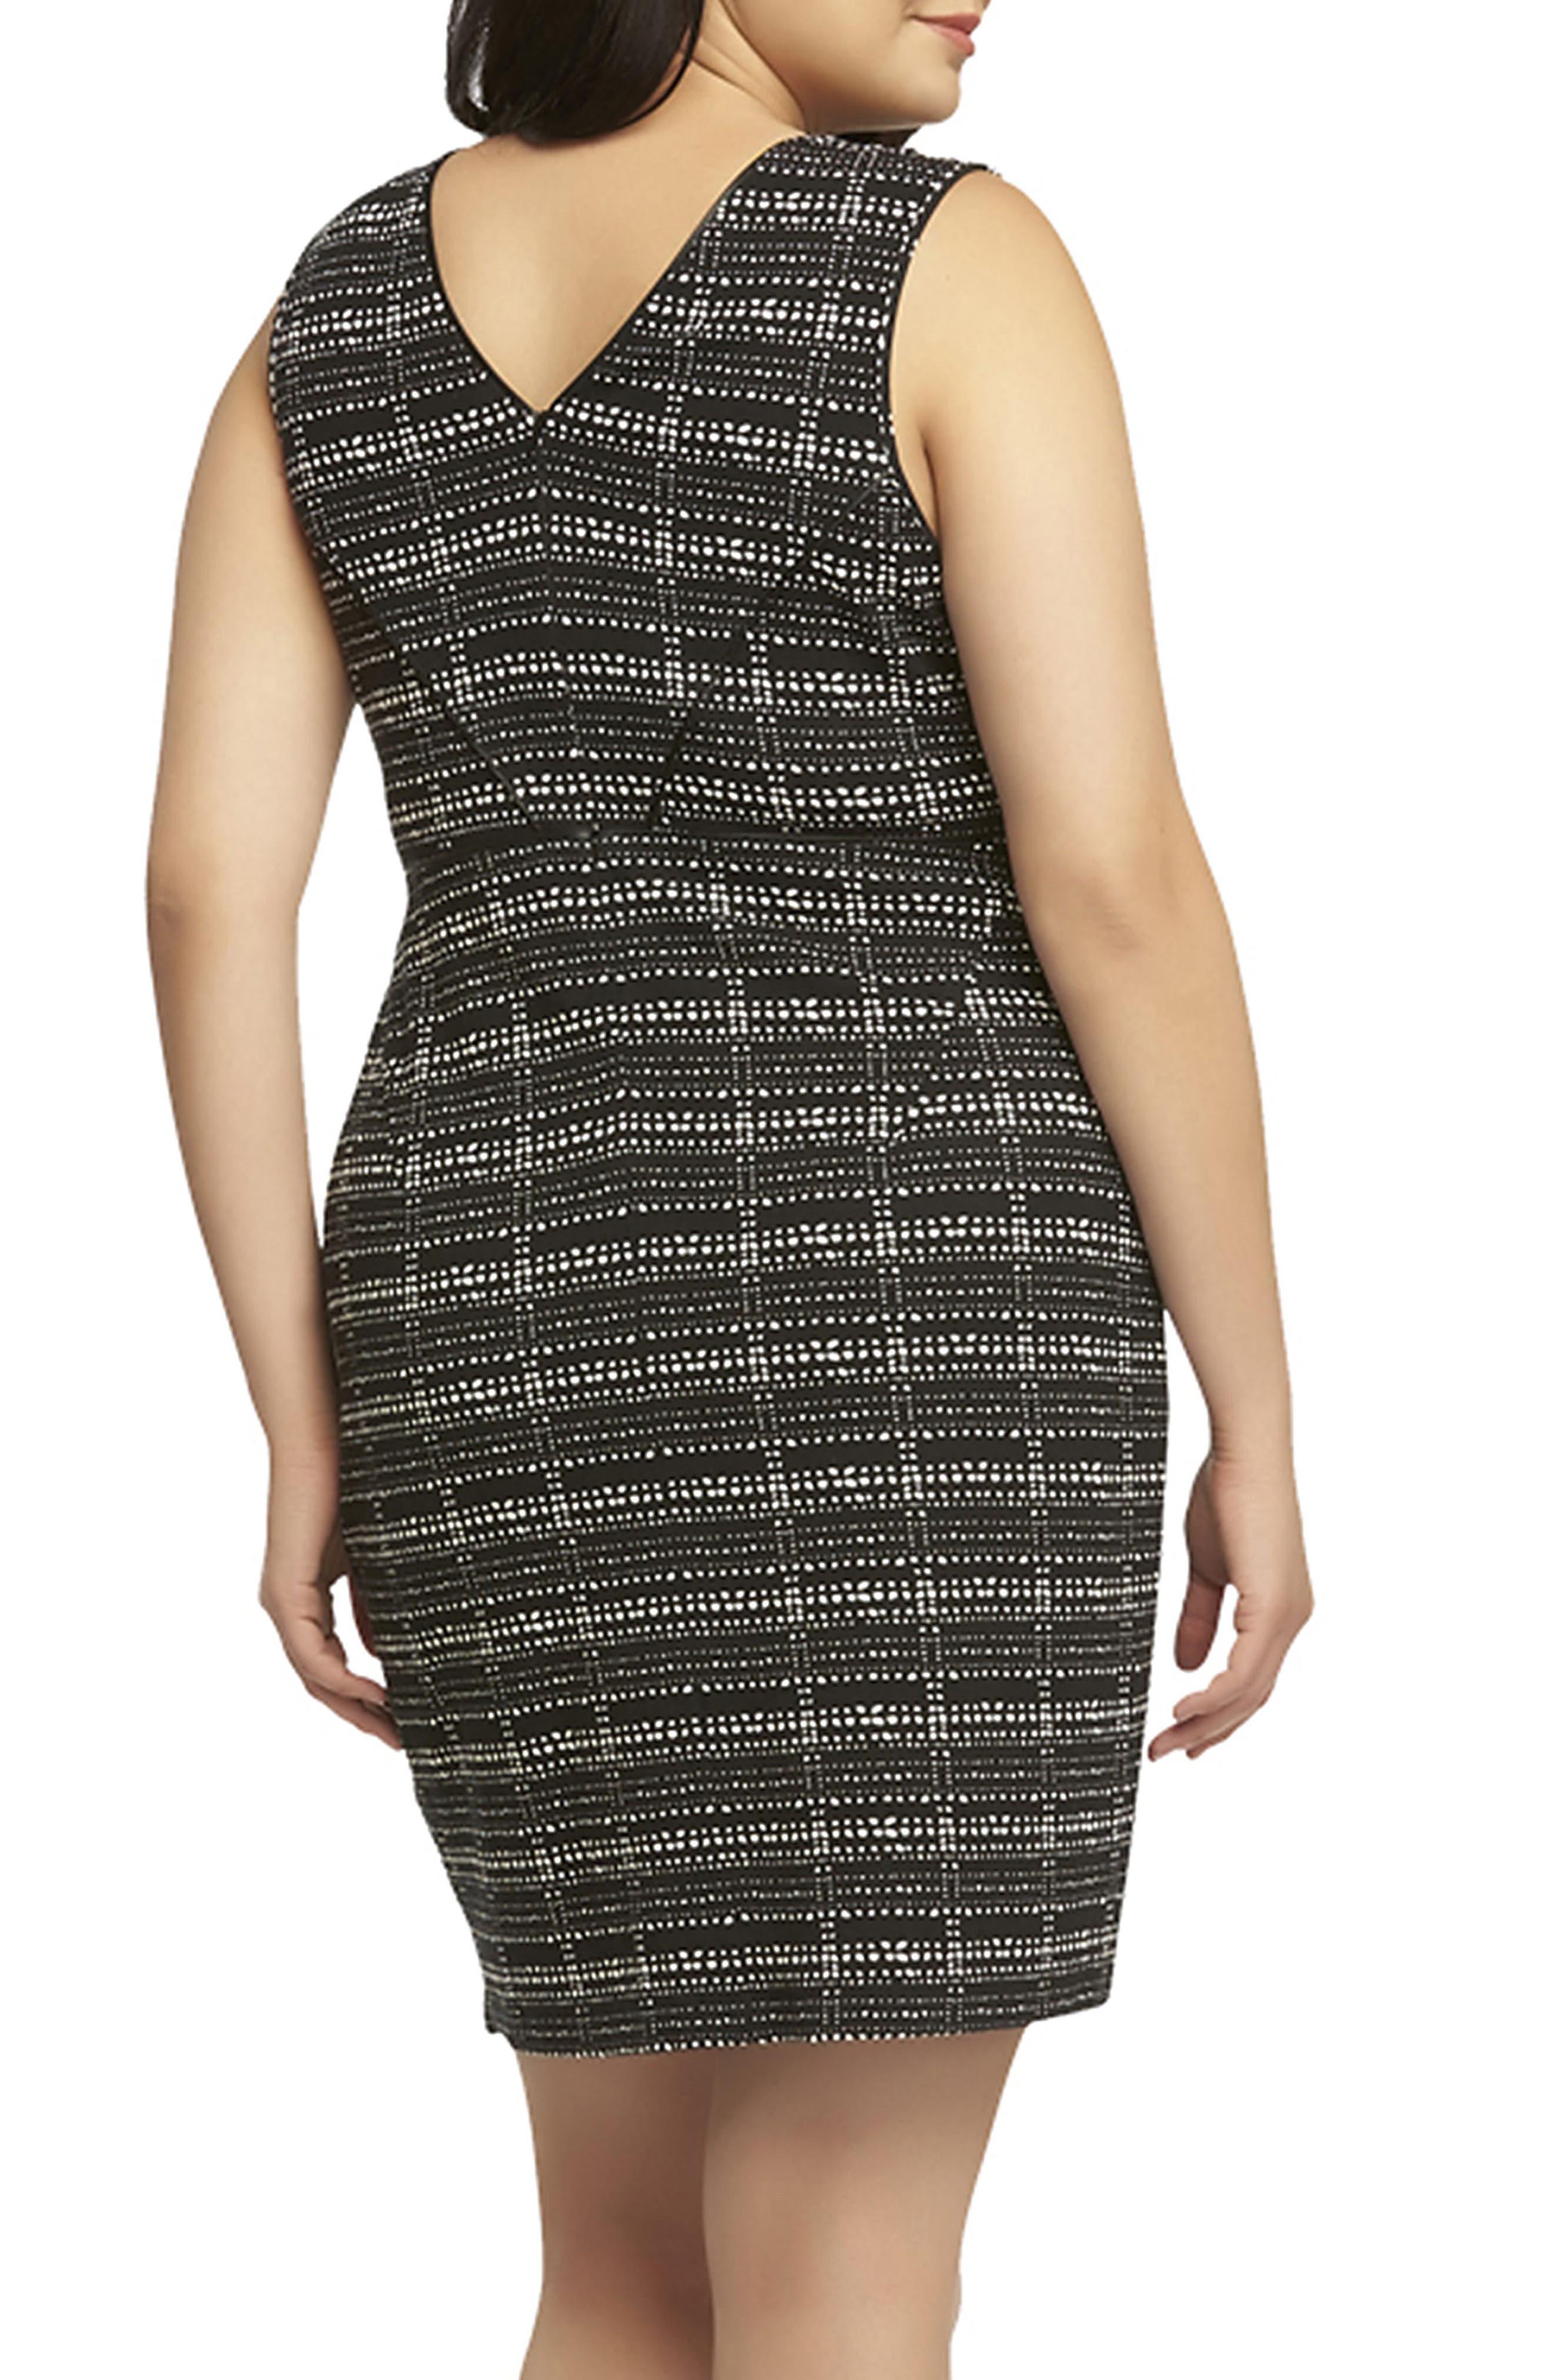 Alternate Image 2  - Tart 'Viera' Piped Detail V-Neck Sheath Dress (Plus Size)